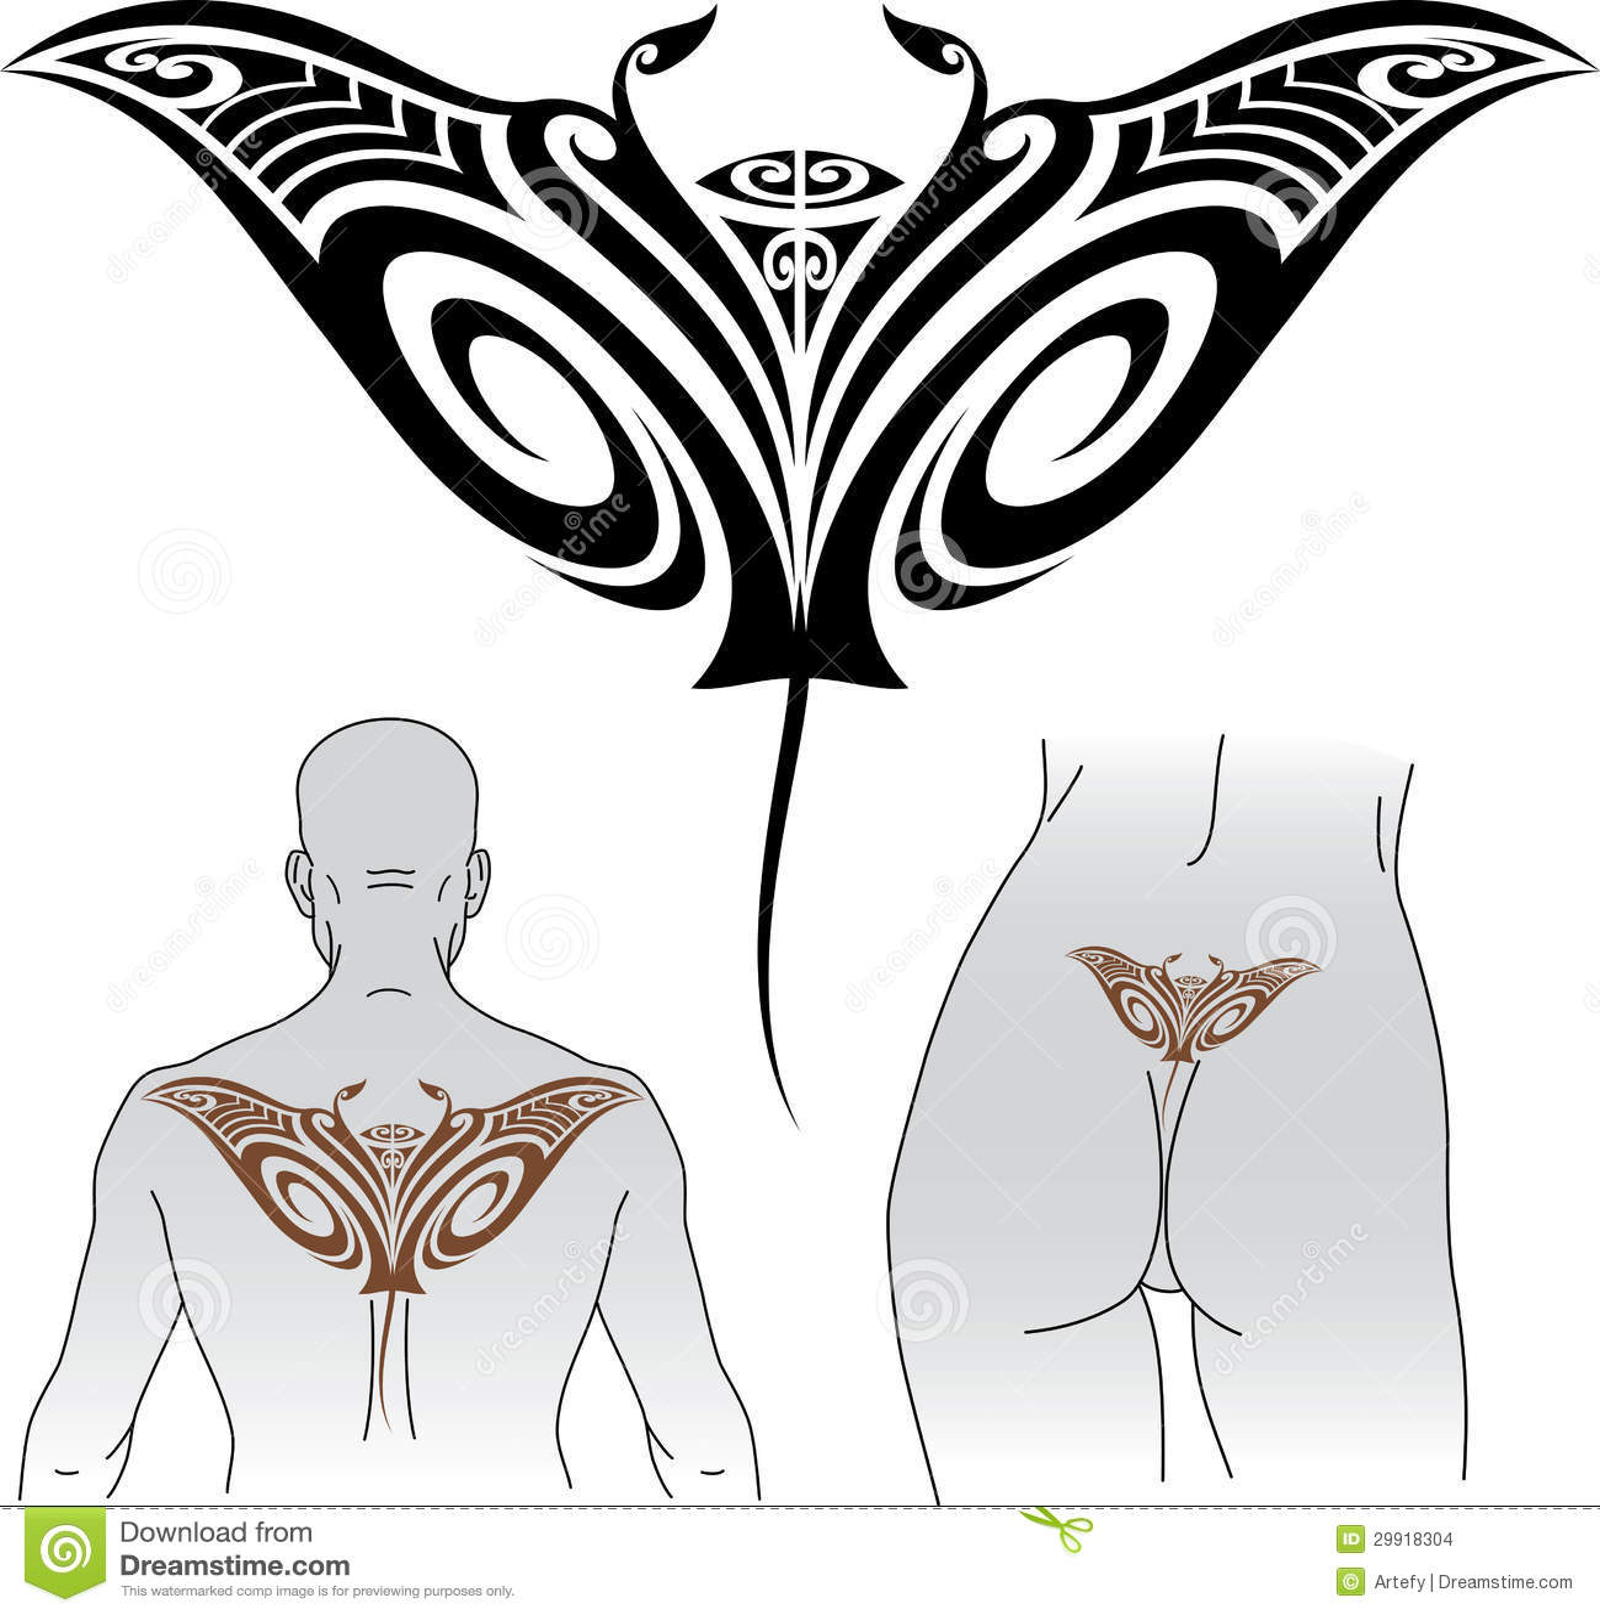 b21763ff25f30 Maori Manta tattoo design stock vector. Illustration of ornament ...